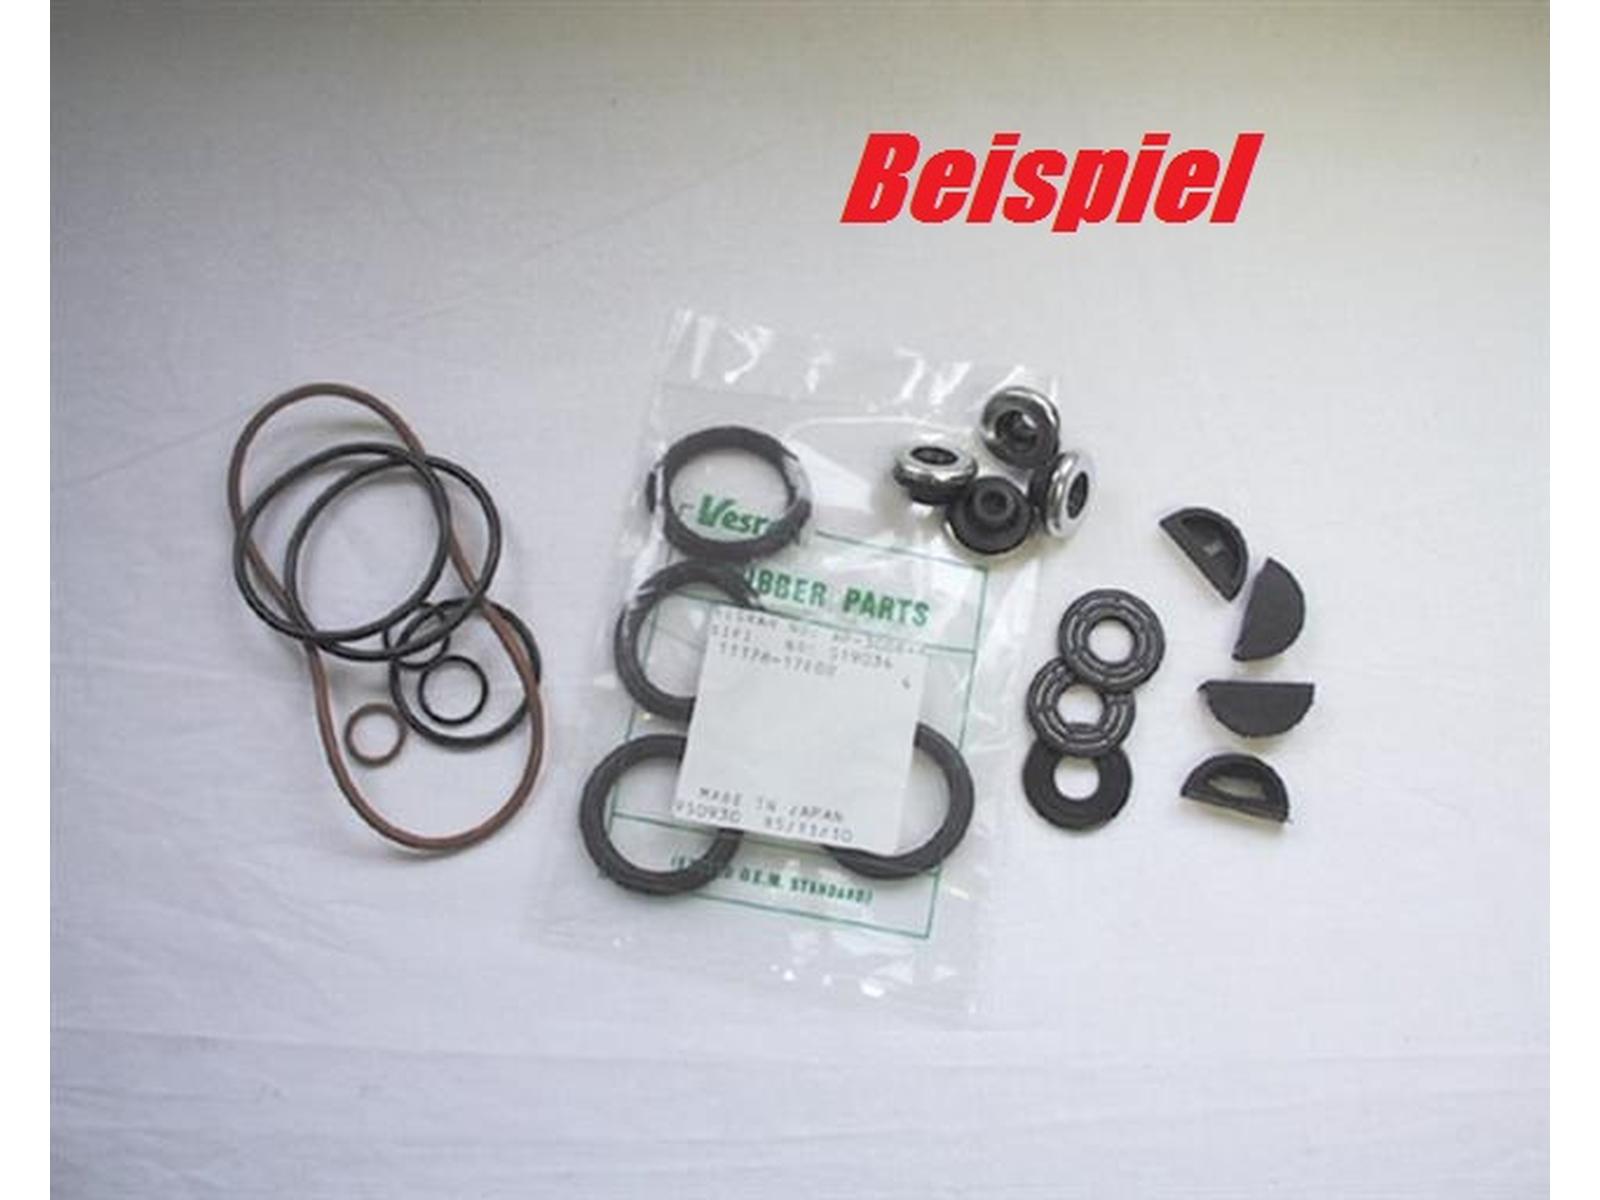 Ventildeckeldichtung Kawasaki Klr 600/650